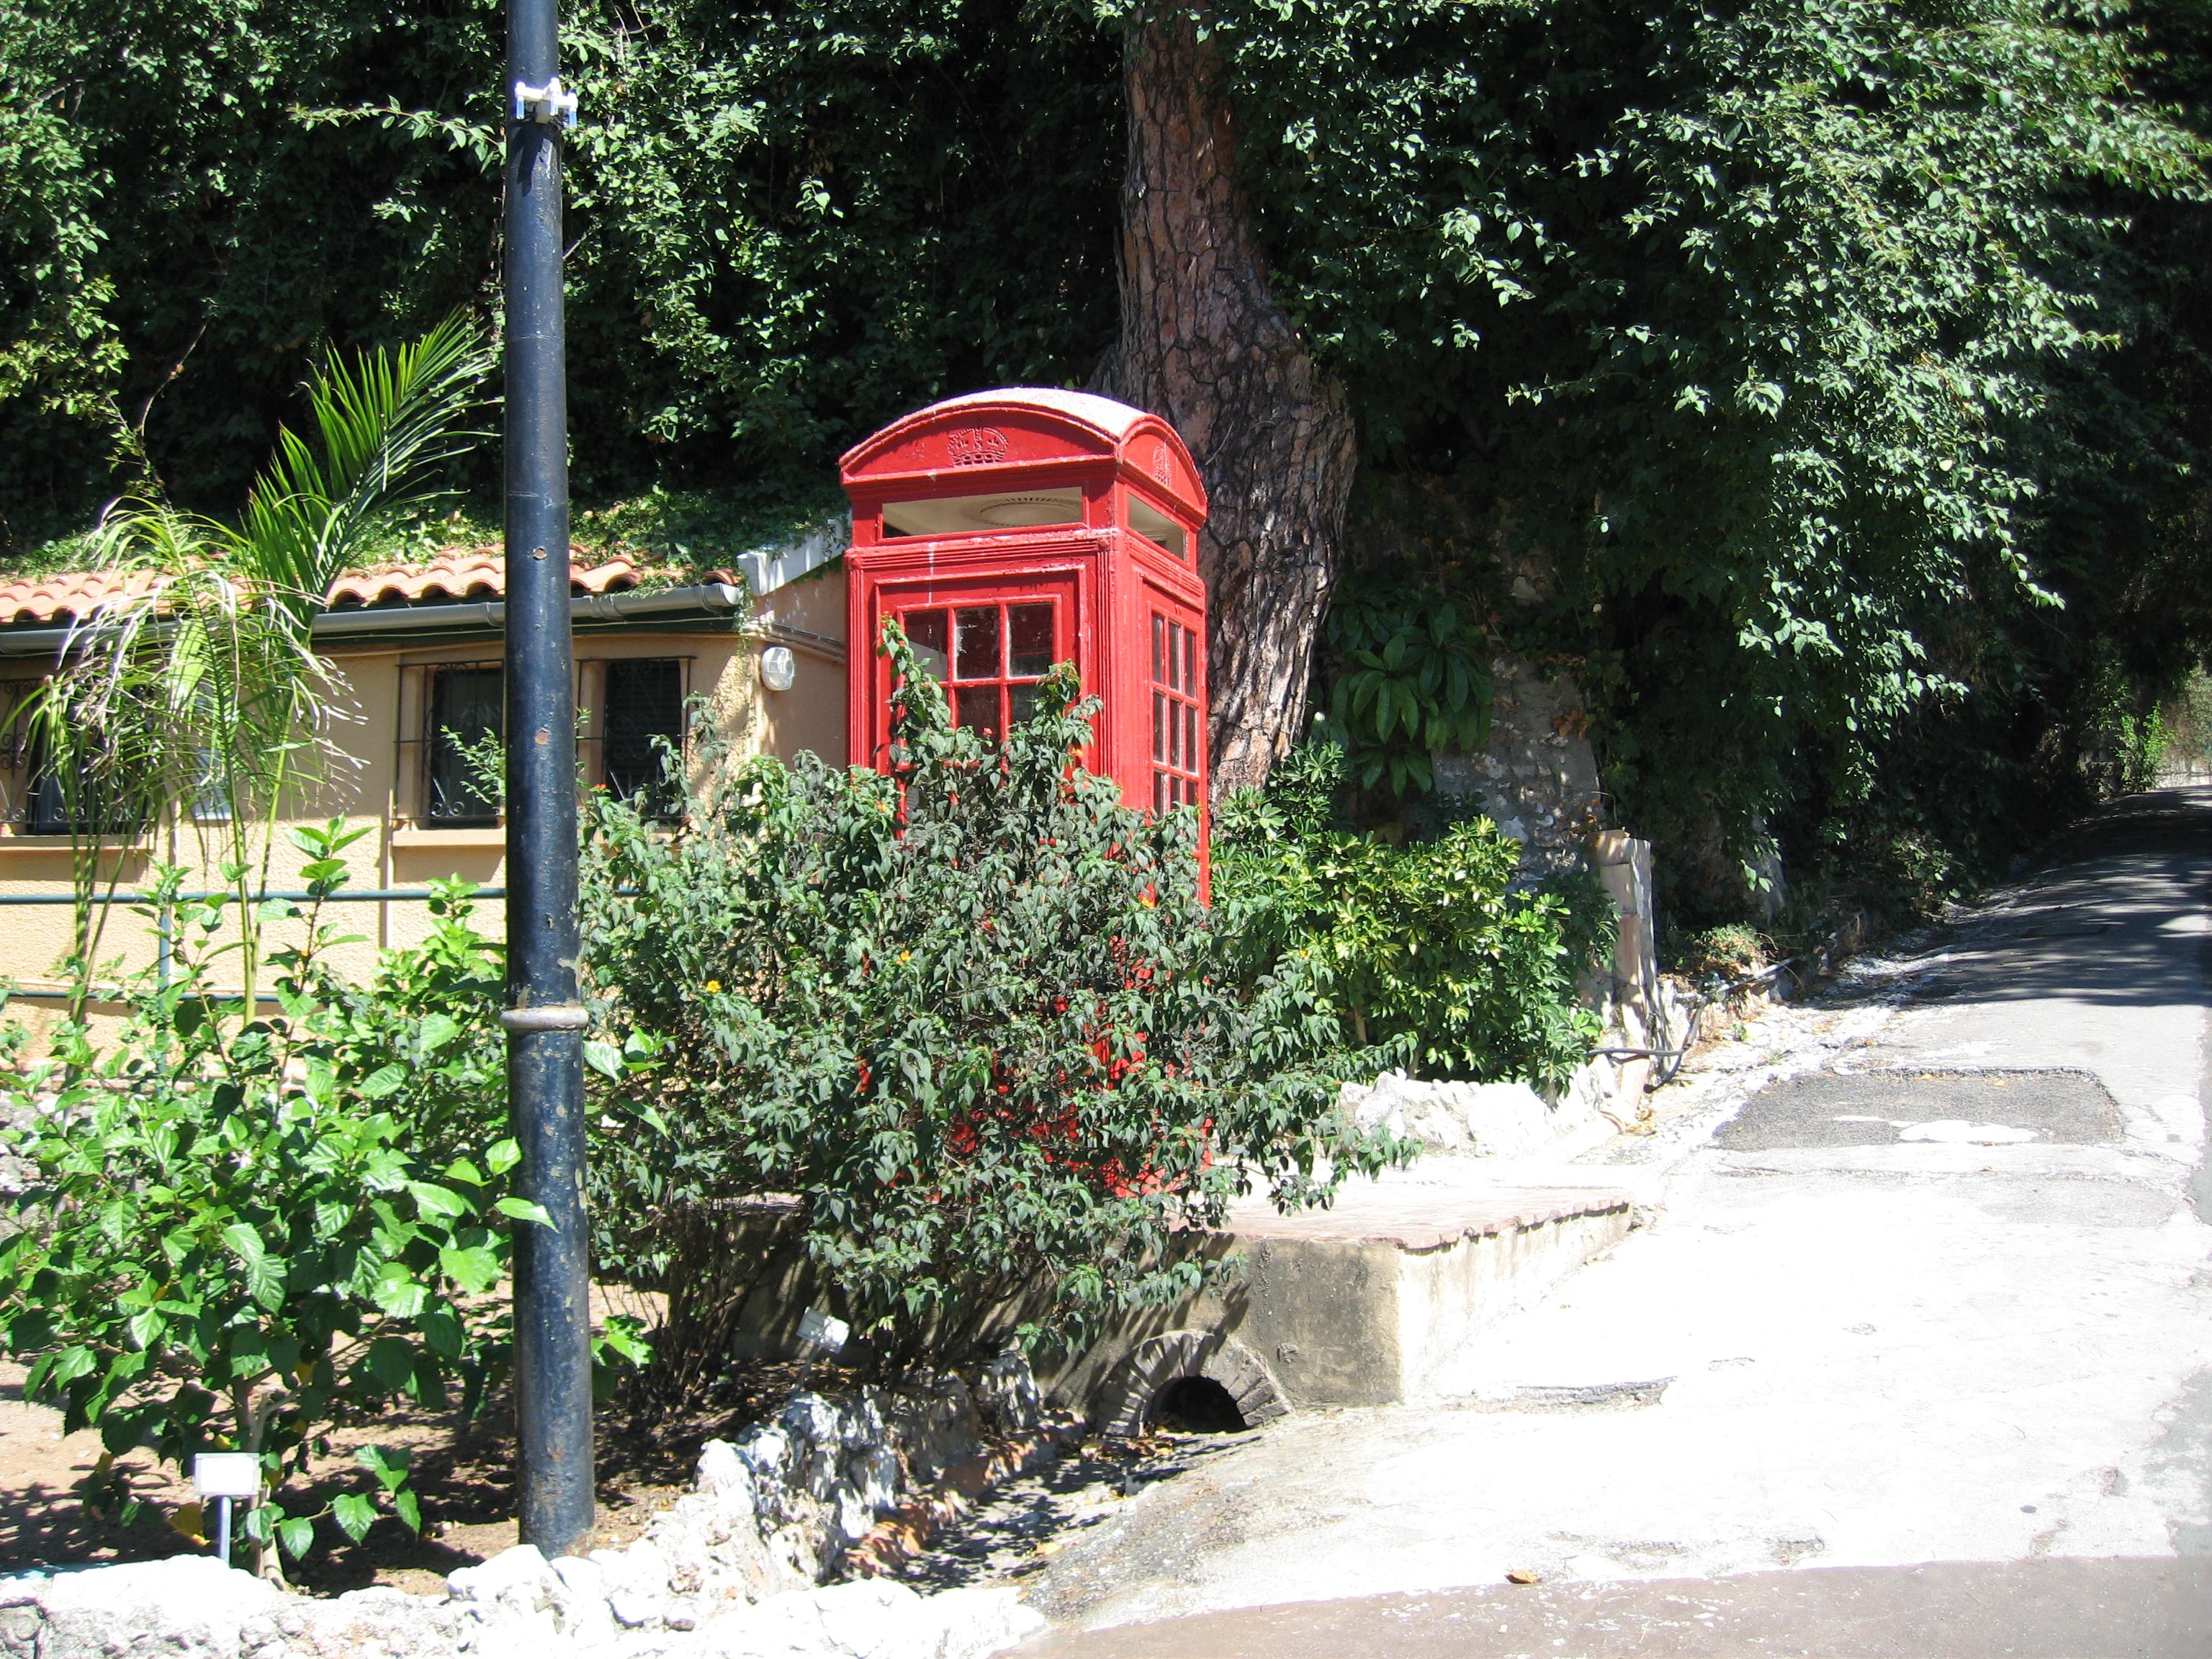 Ordinaire File:Red Phone Box   Gibraltar Botanic Gardens 2